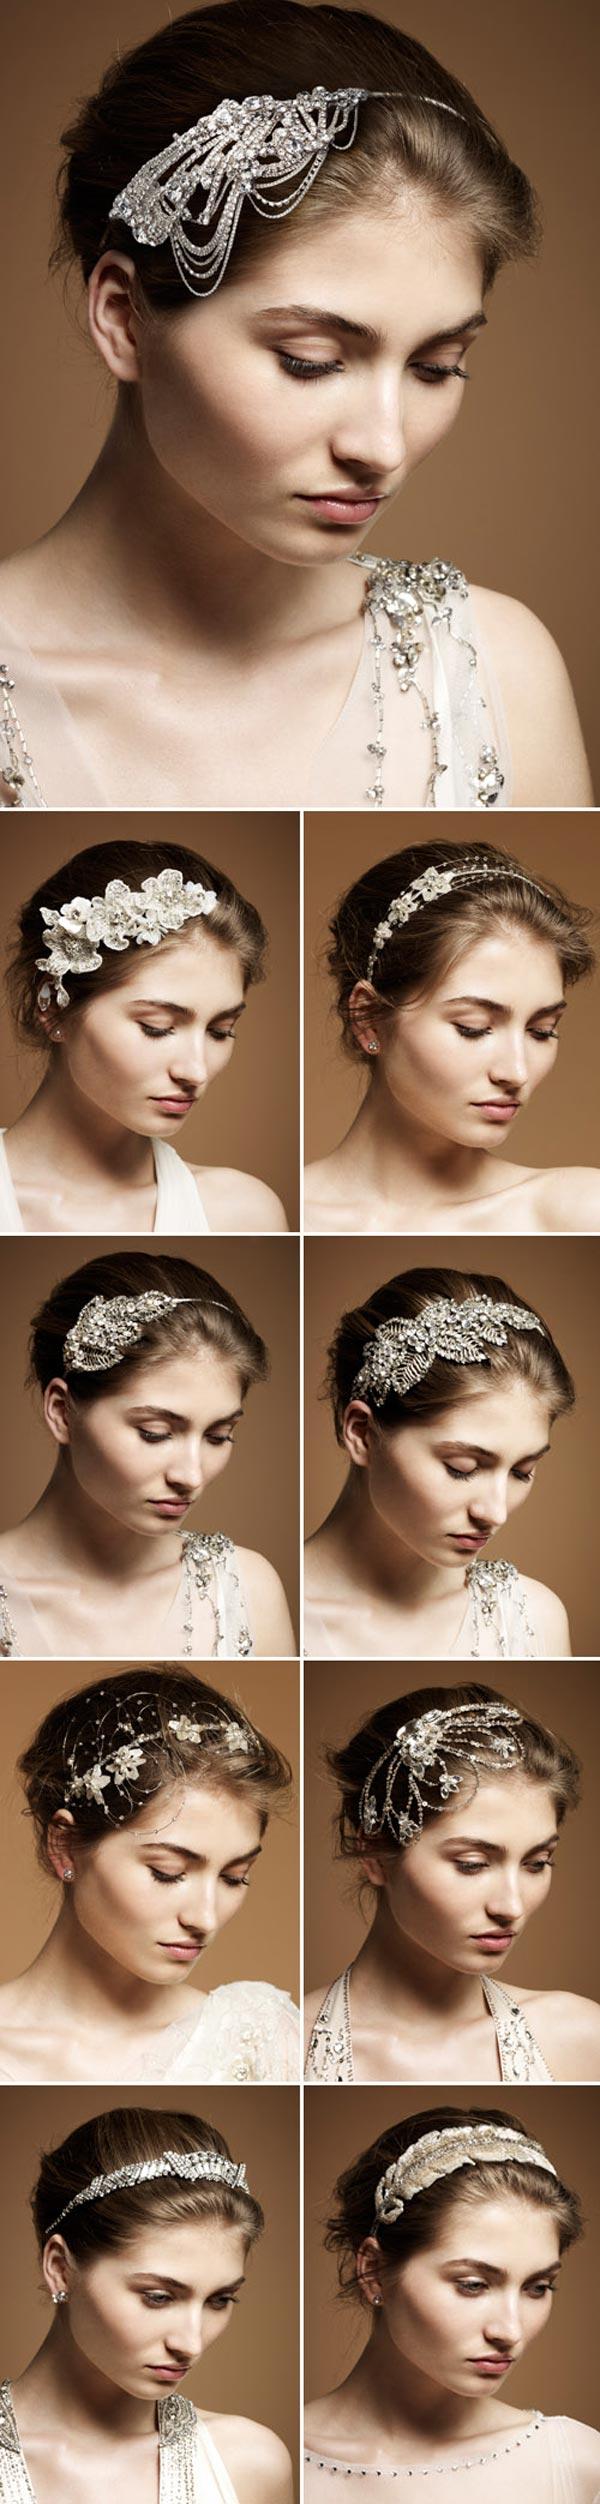 weddingstylist Jenny Packha Αξεσουάρ για τα μαλλάκια από την Jenny Packham